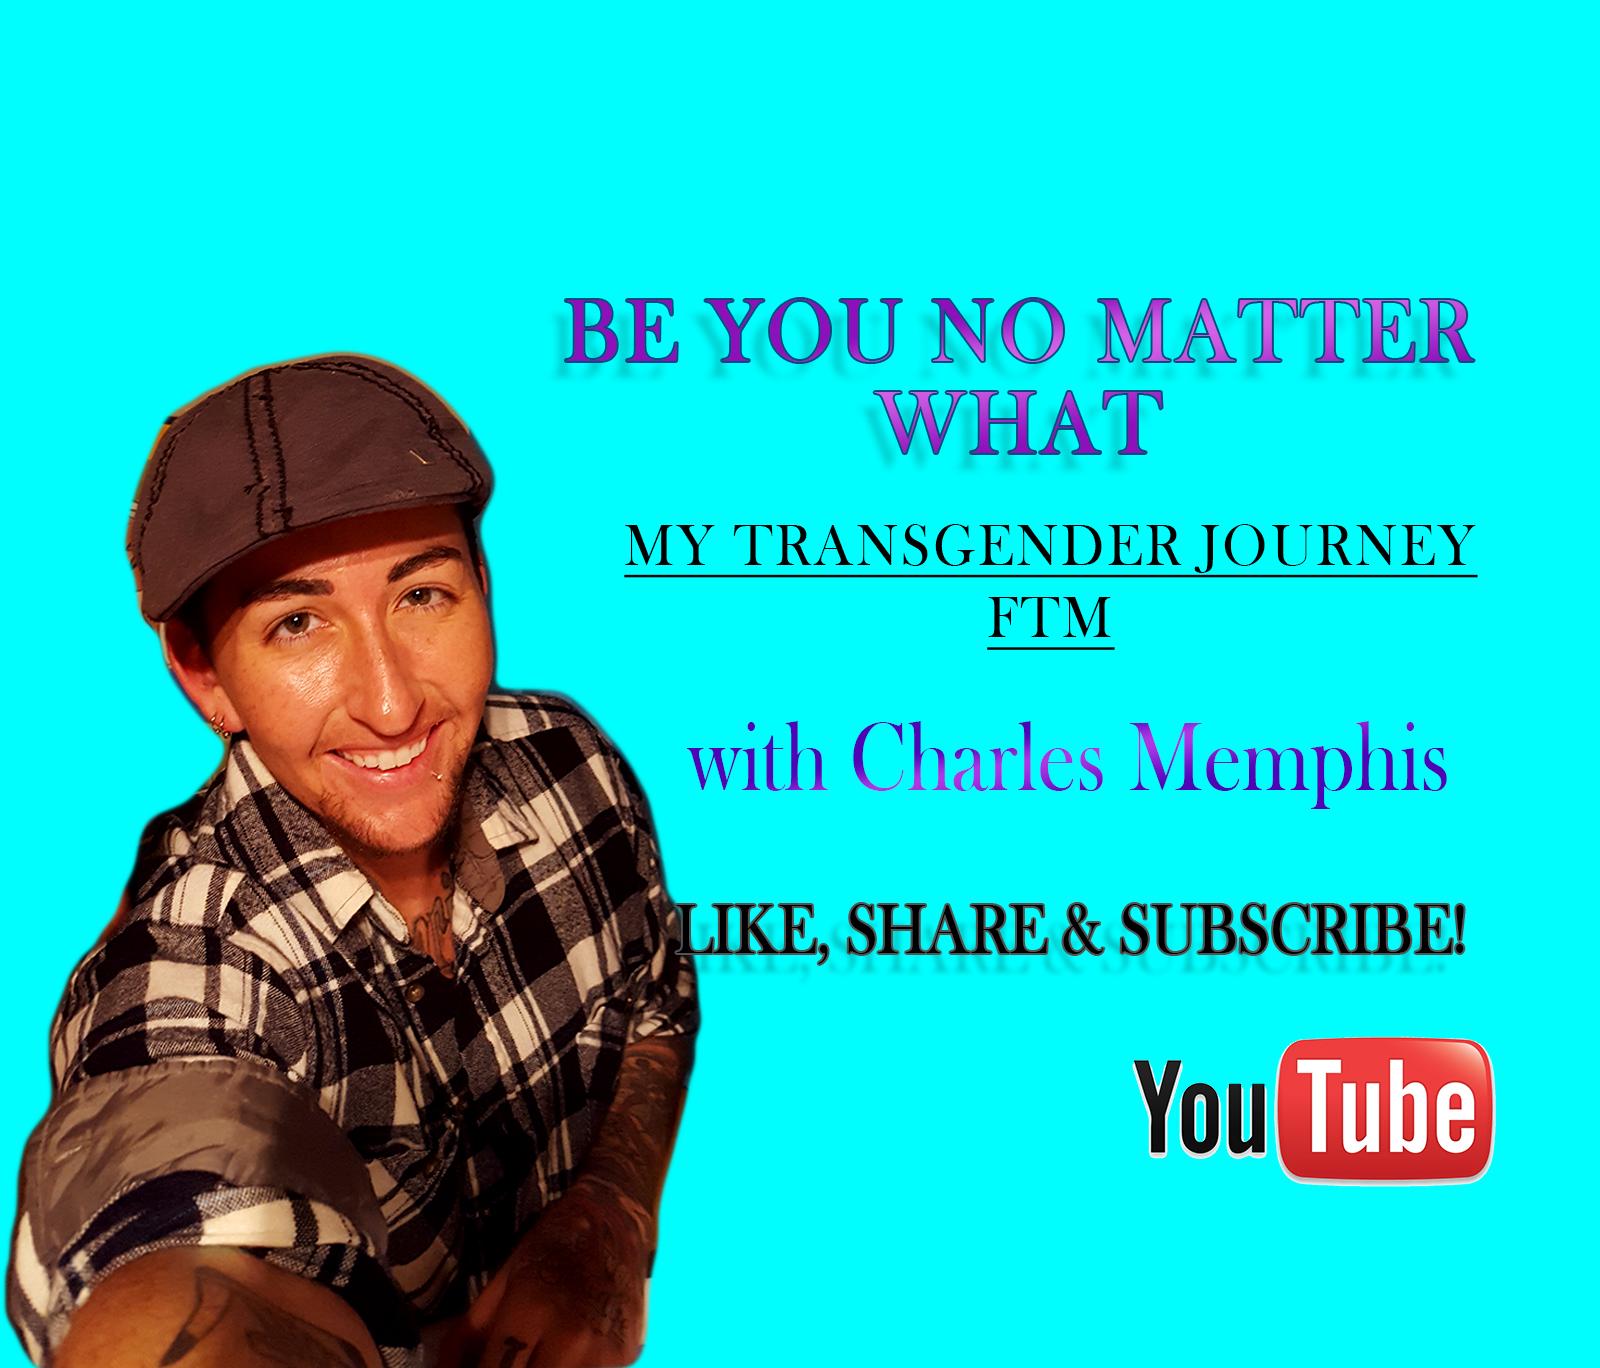 Be You No Matter What - Transgender Journey - FTM